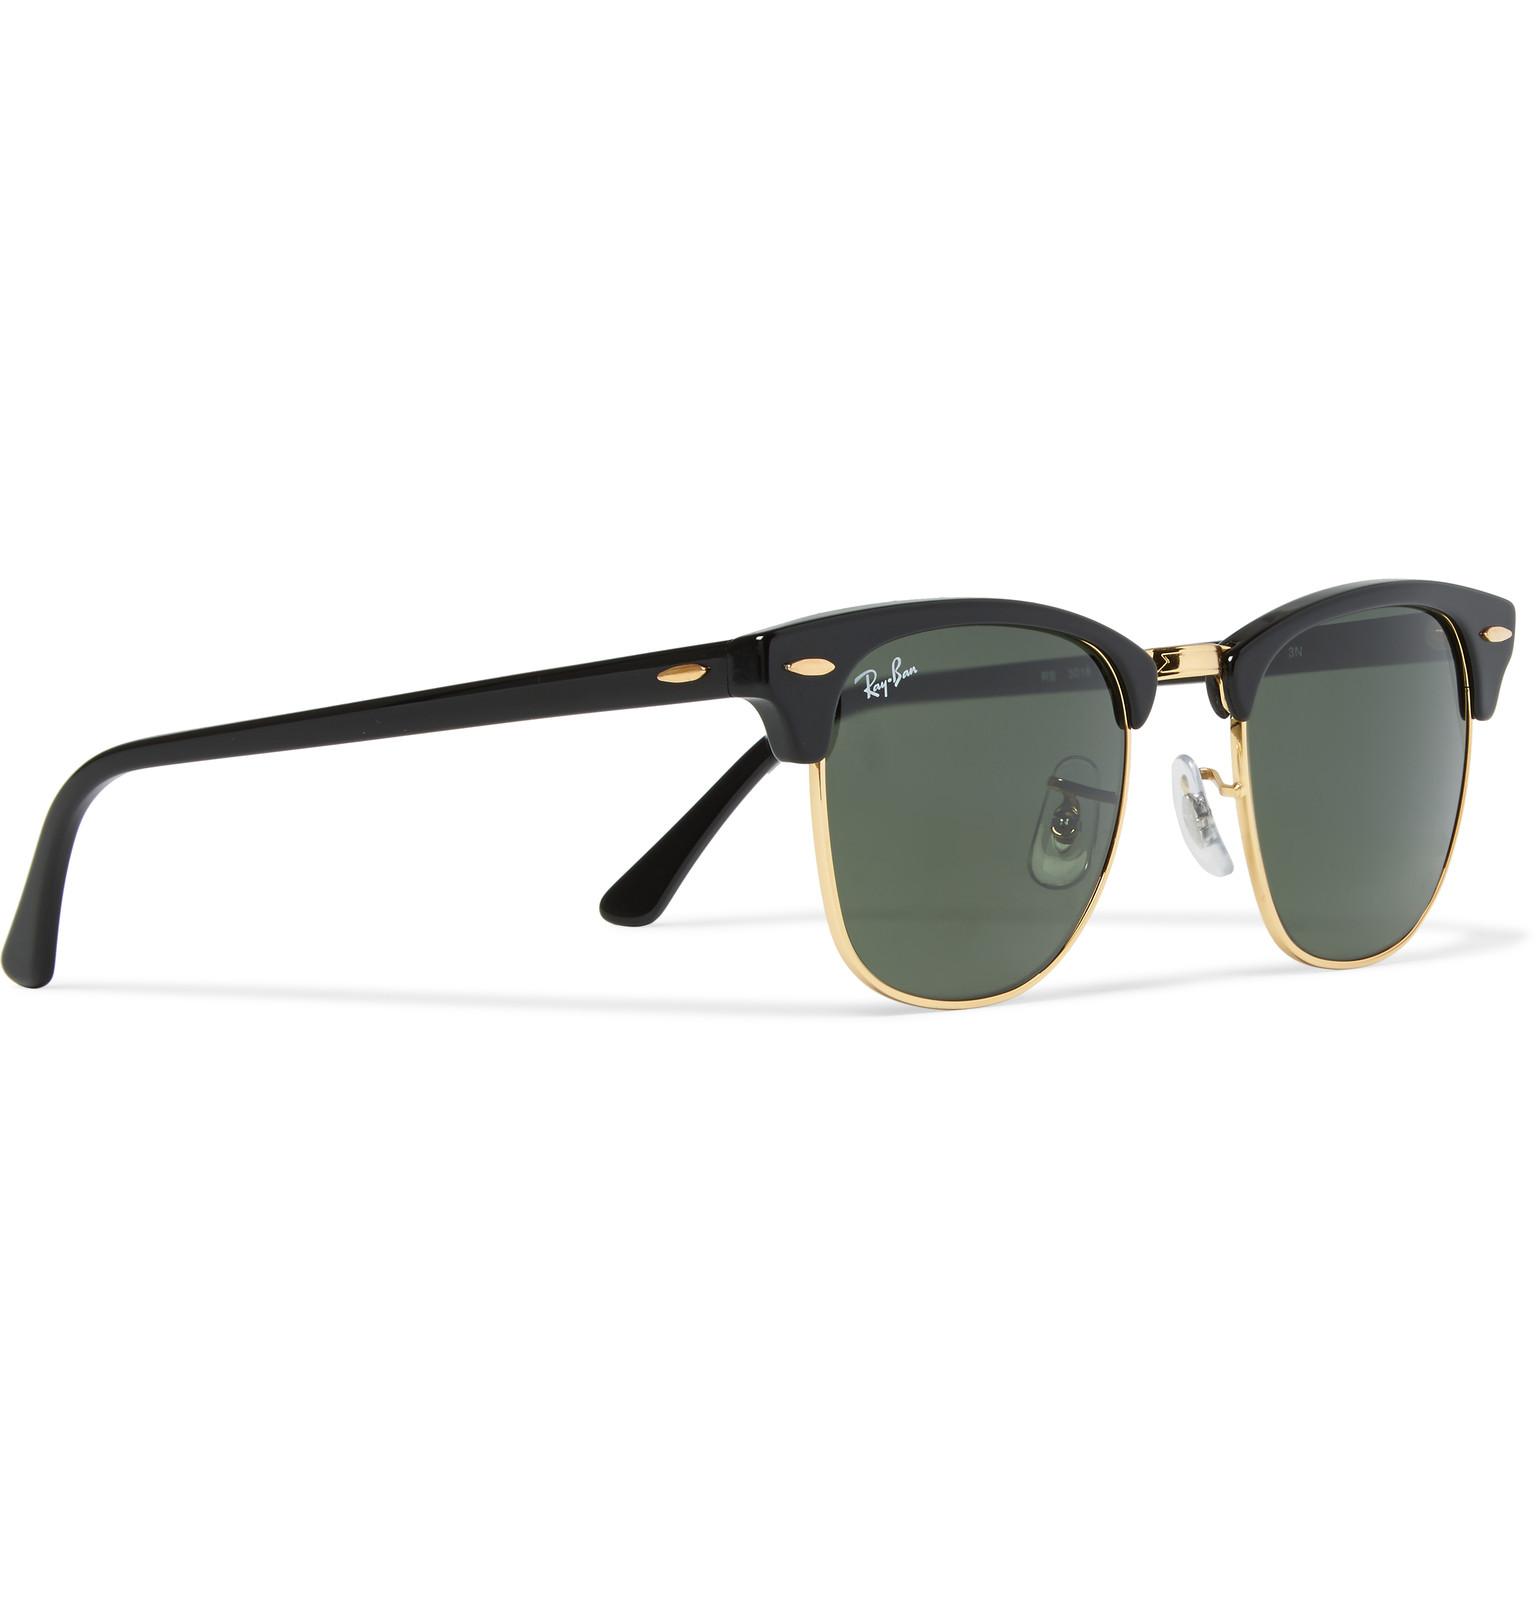 ecbc975edb2 Ray-Ban - Clubmaster Square-Frame Acetate and Gold-Tone Sunglasses